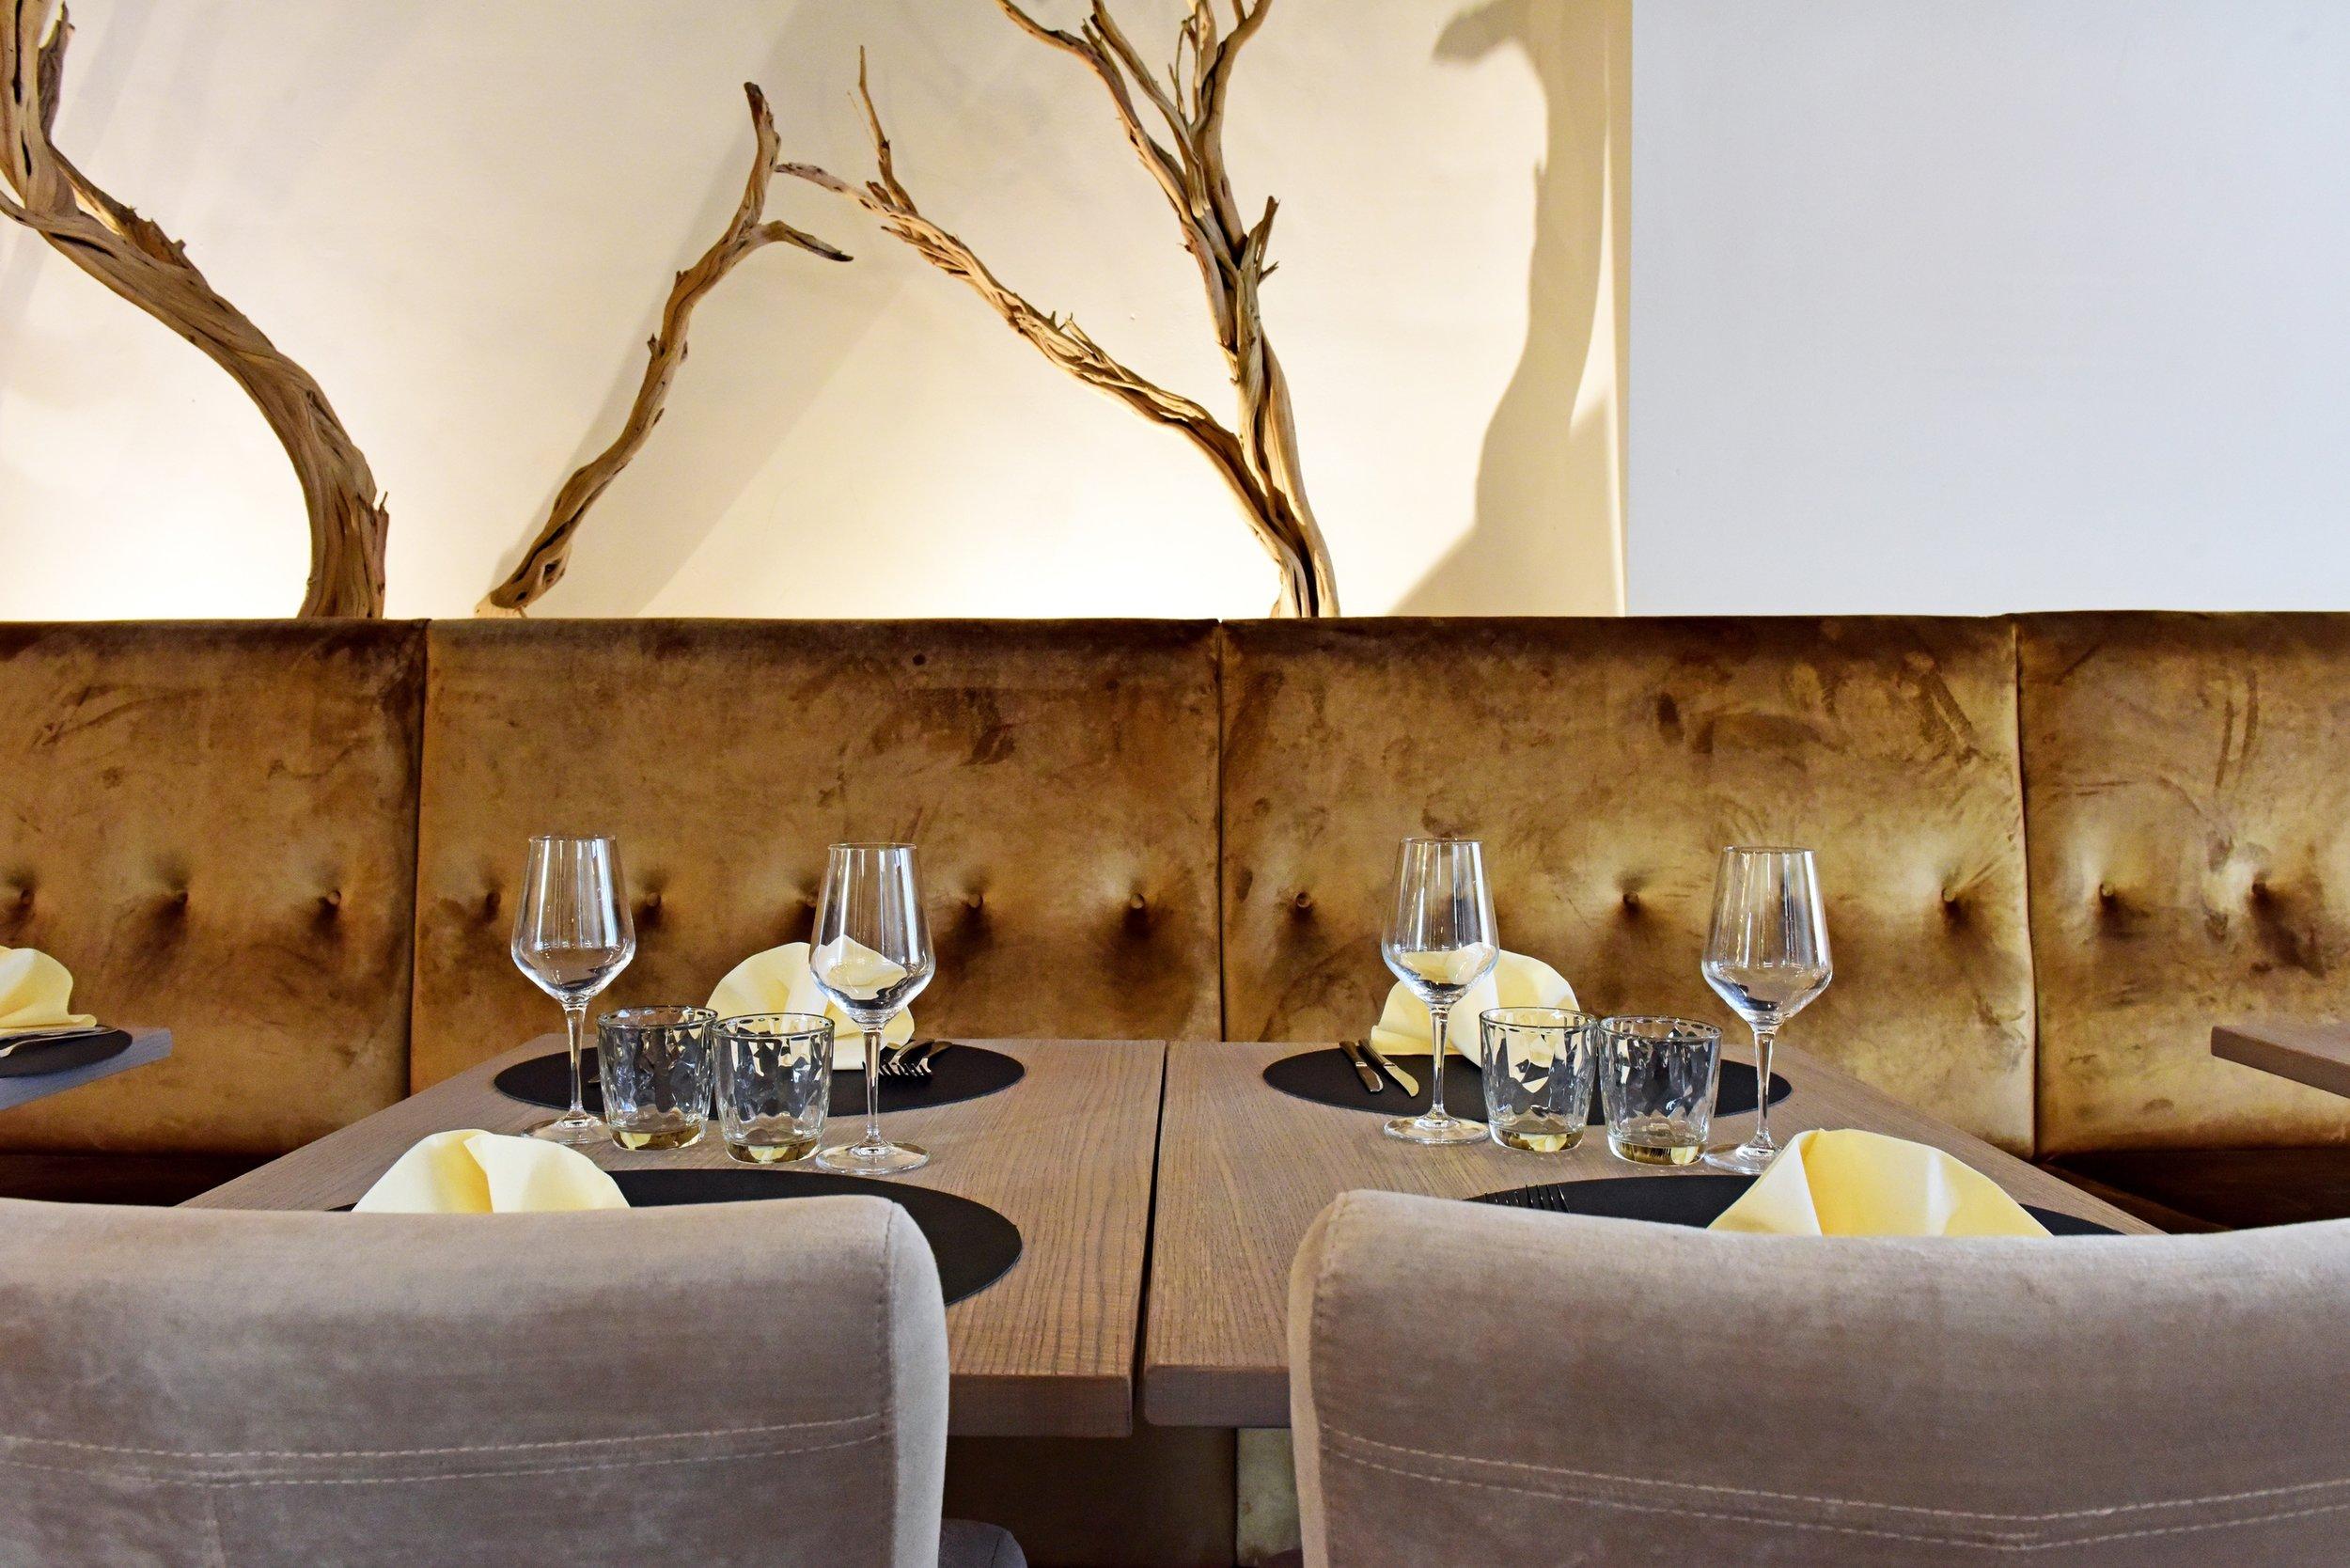 18 italiaans restaurant gent l incontro lincontro.jpg.jpg.jpg.jpg.jpg.jpg